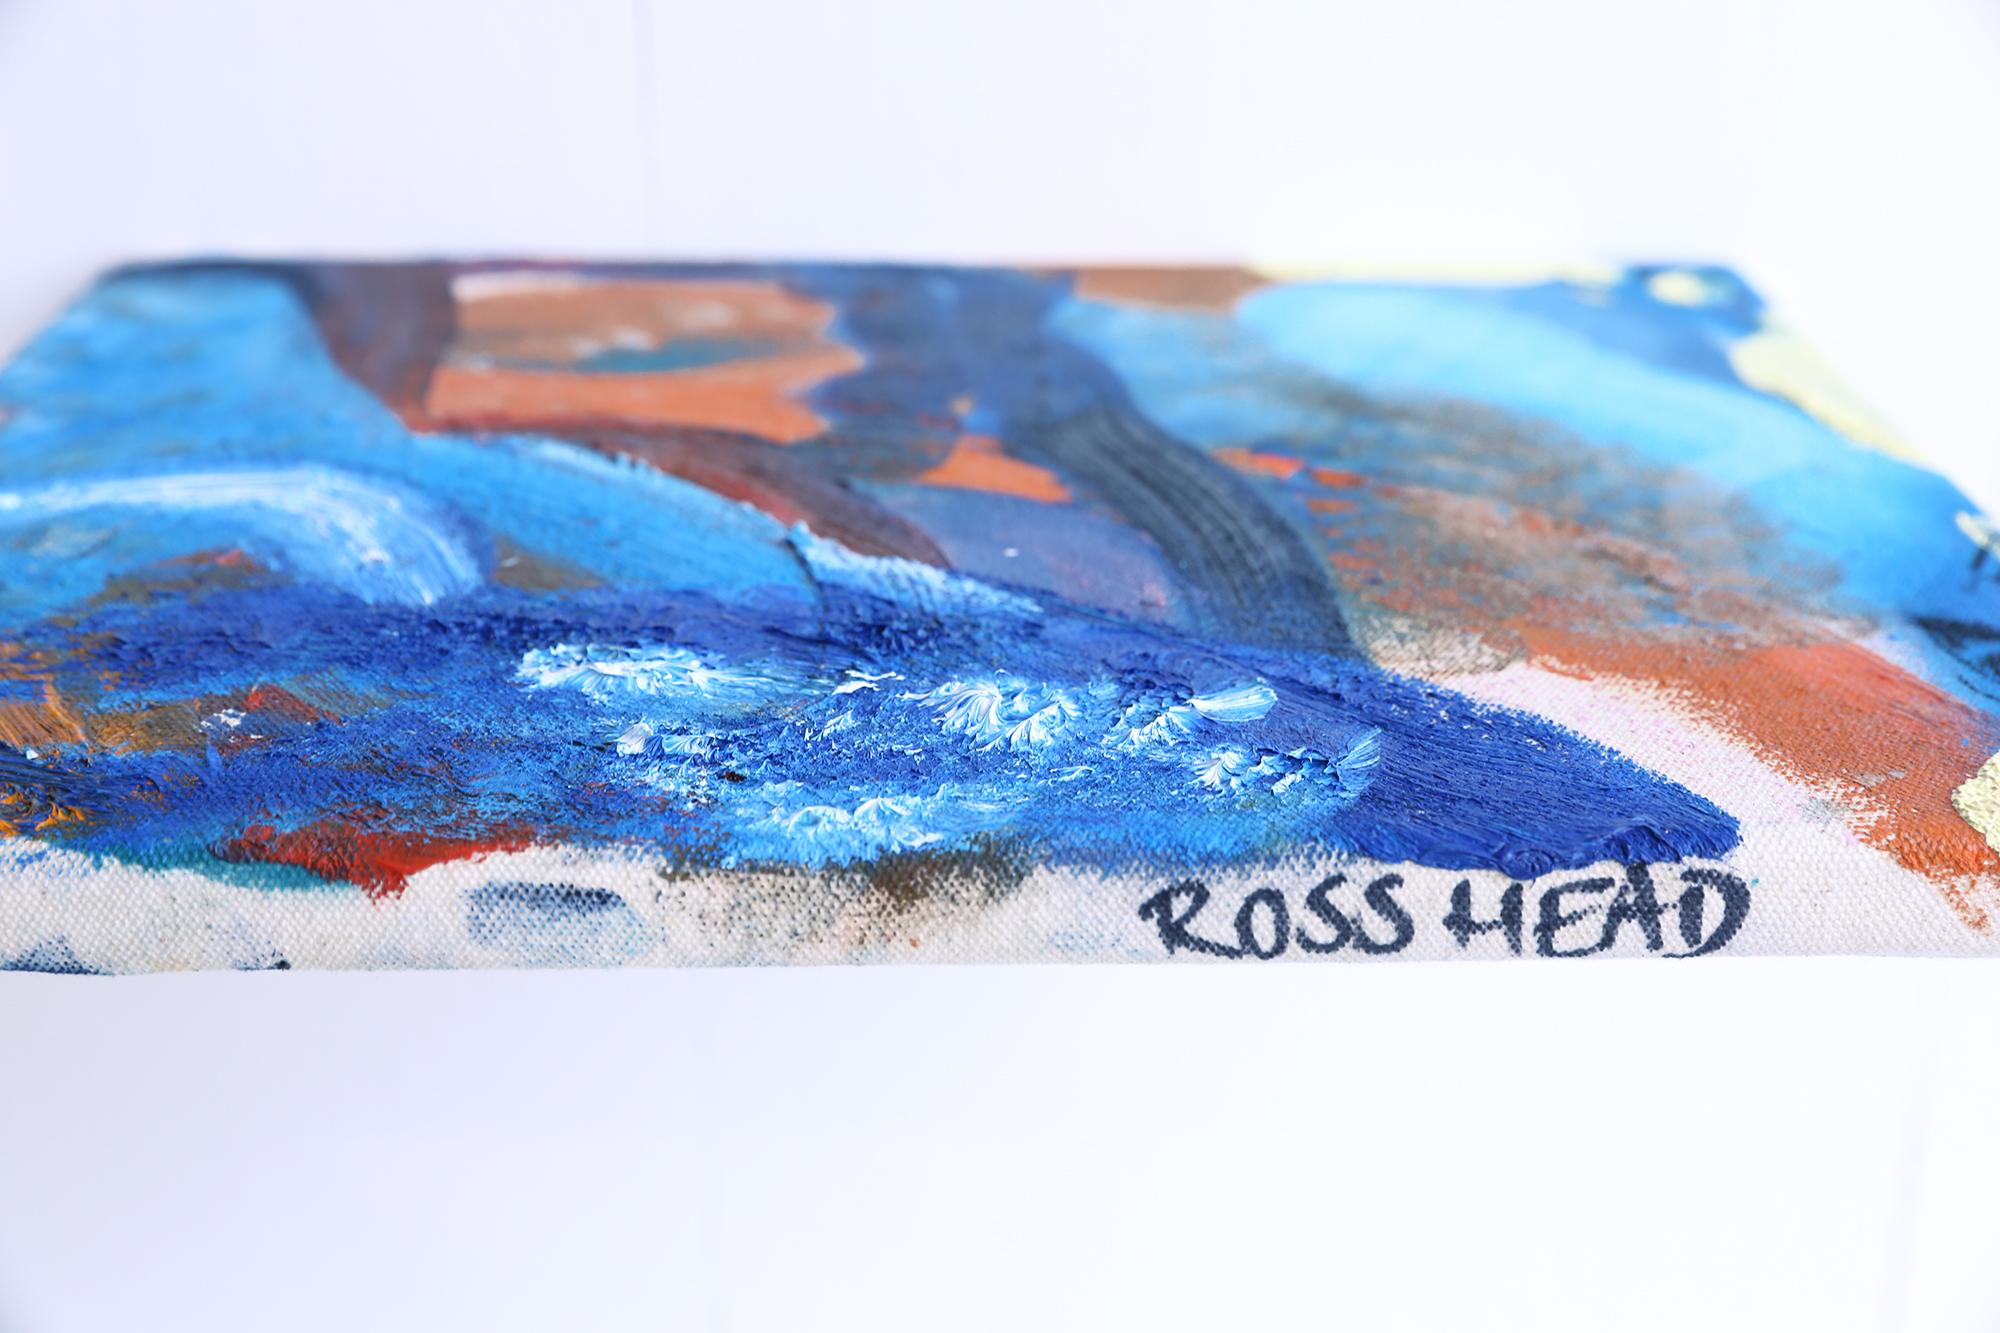 Ross Head